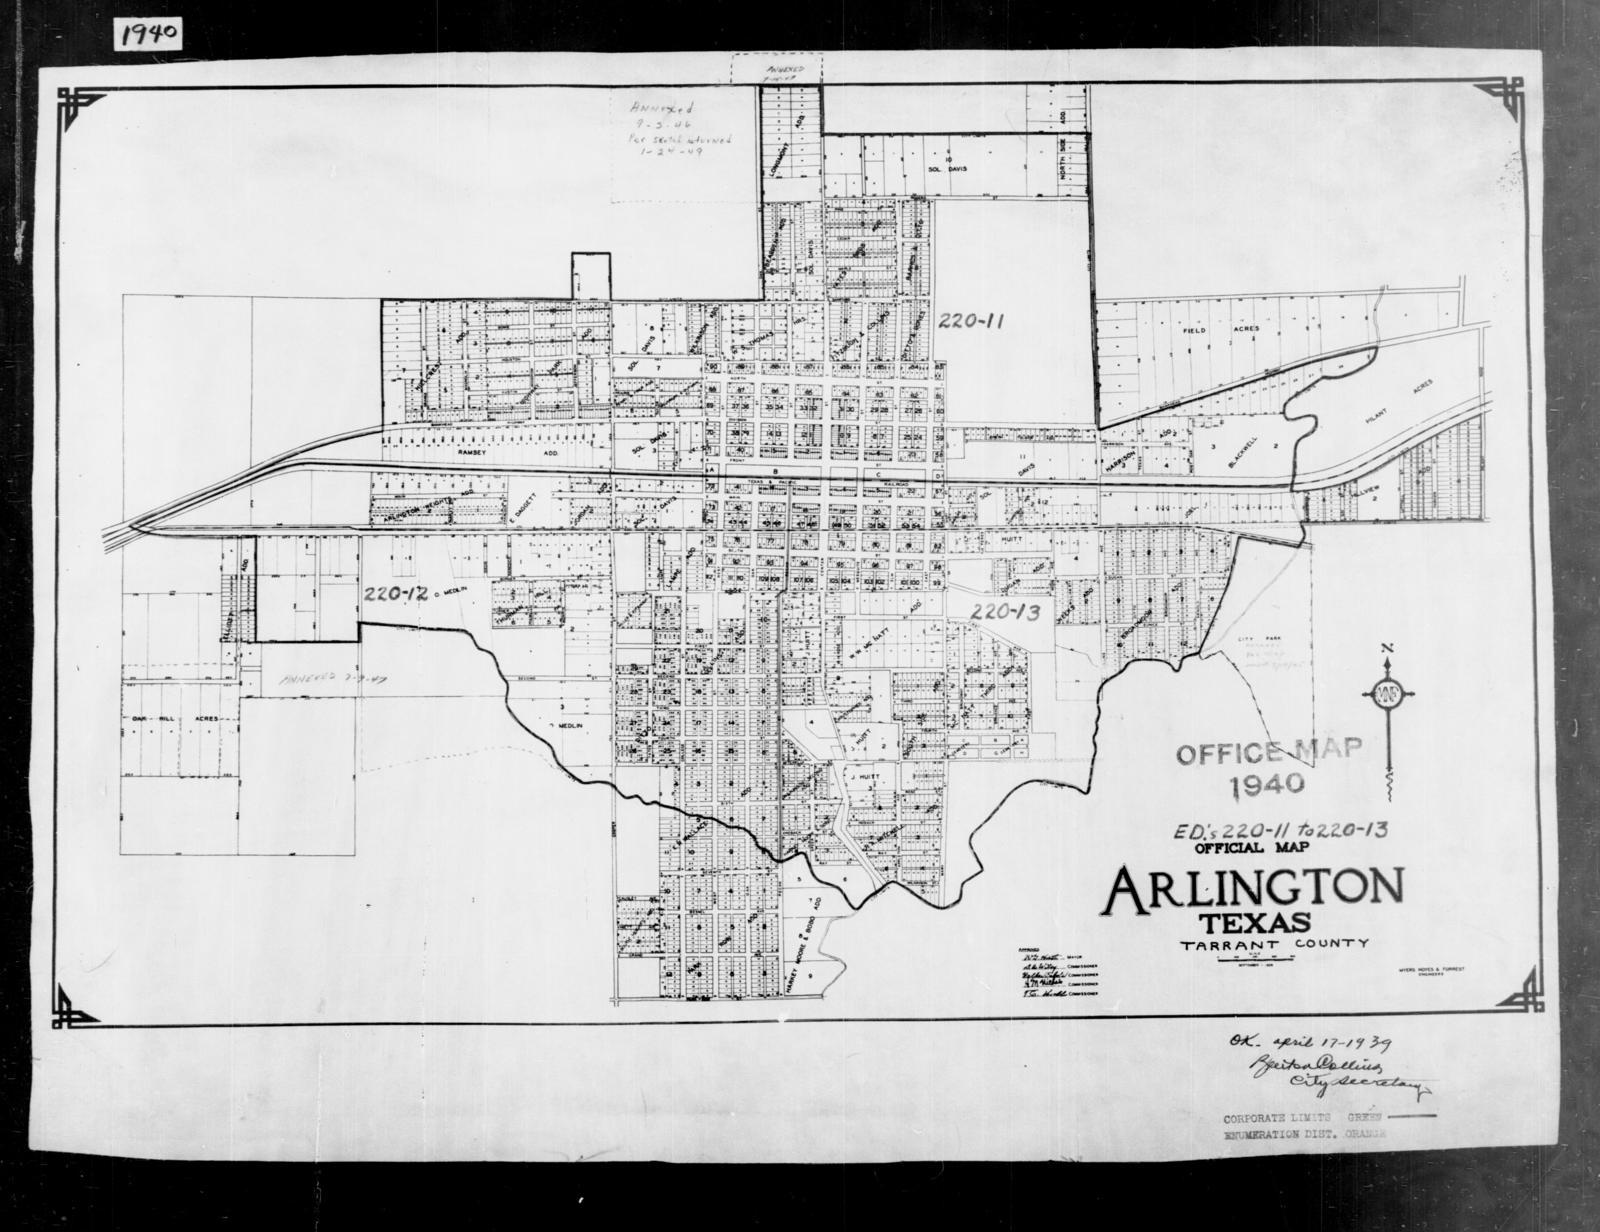 Map Of Texas Arlington.1940 Census Enumeration District Maps Texas Tarrant County